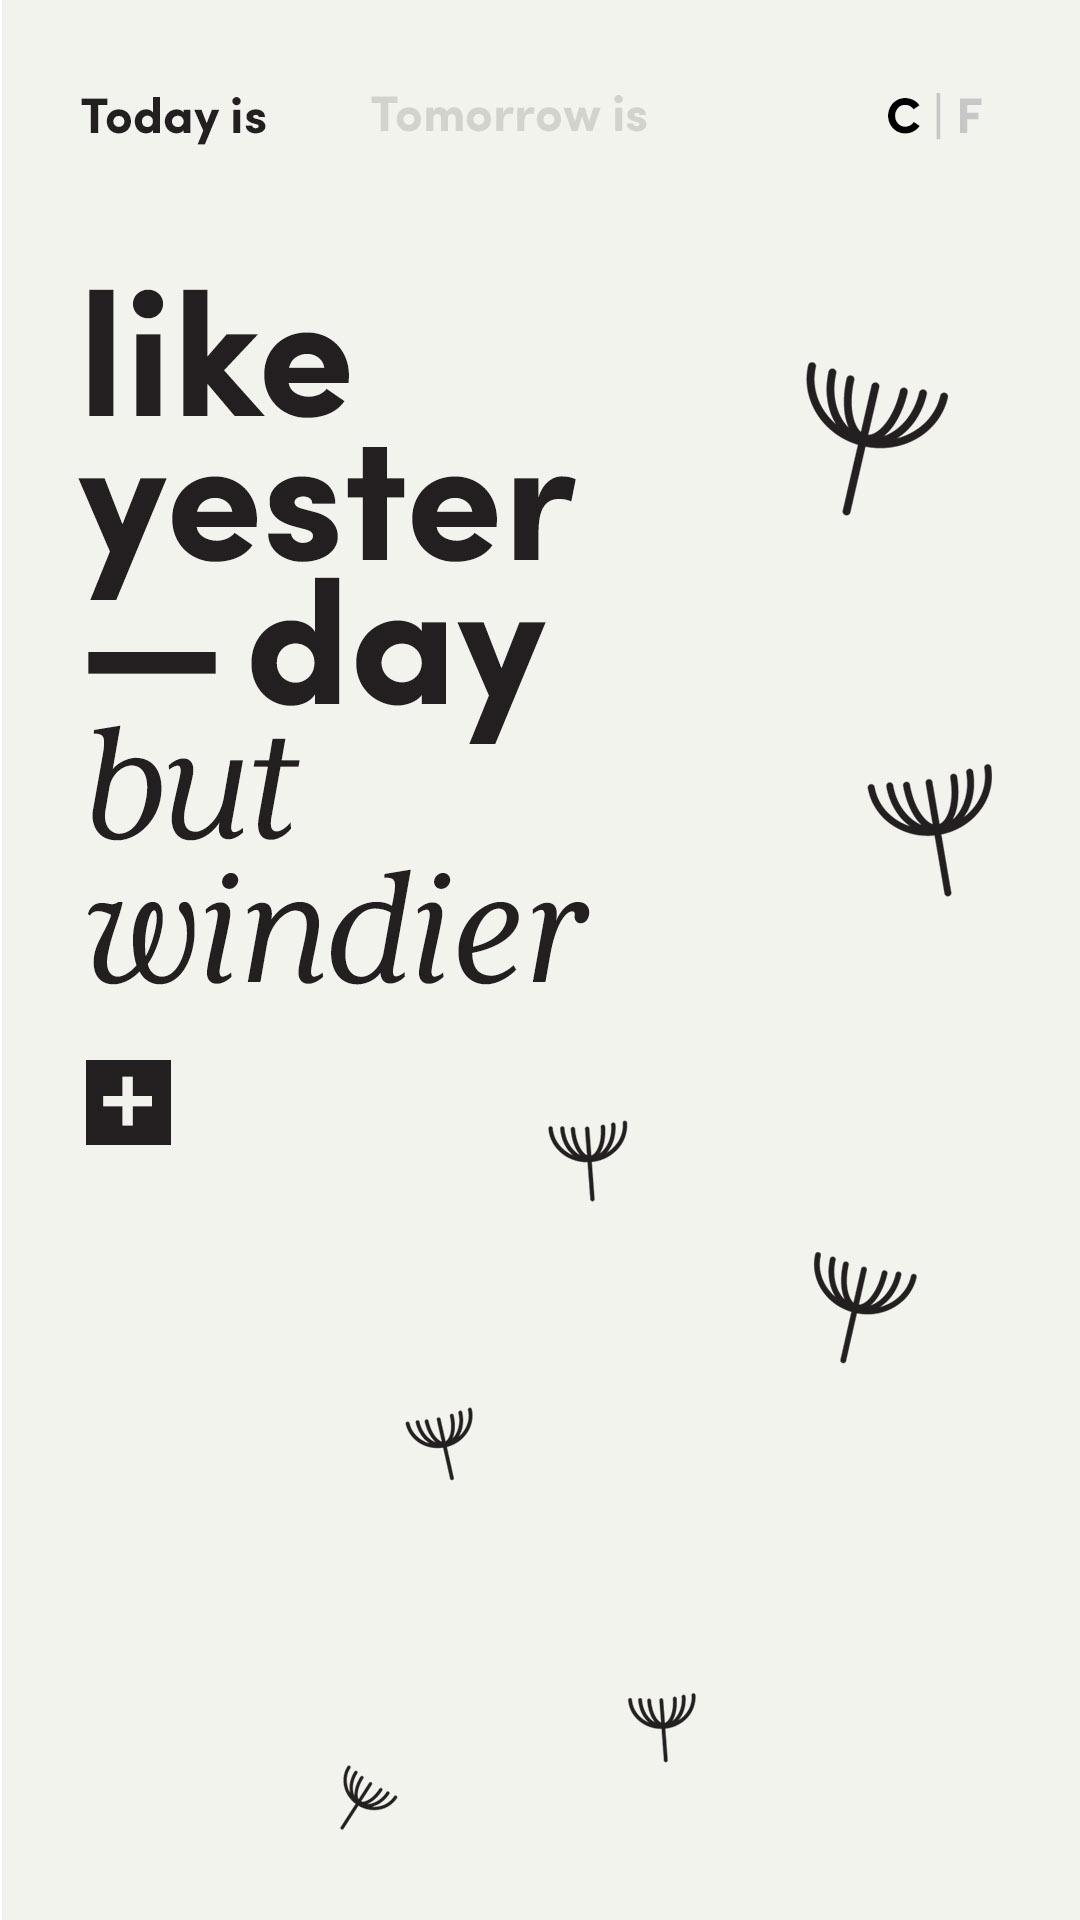 LikeYesterday_0002_but windier